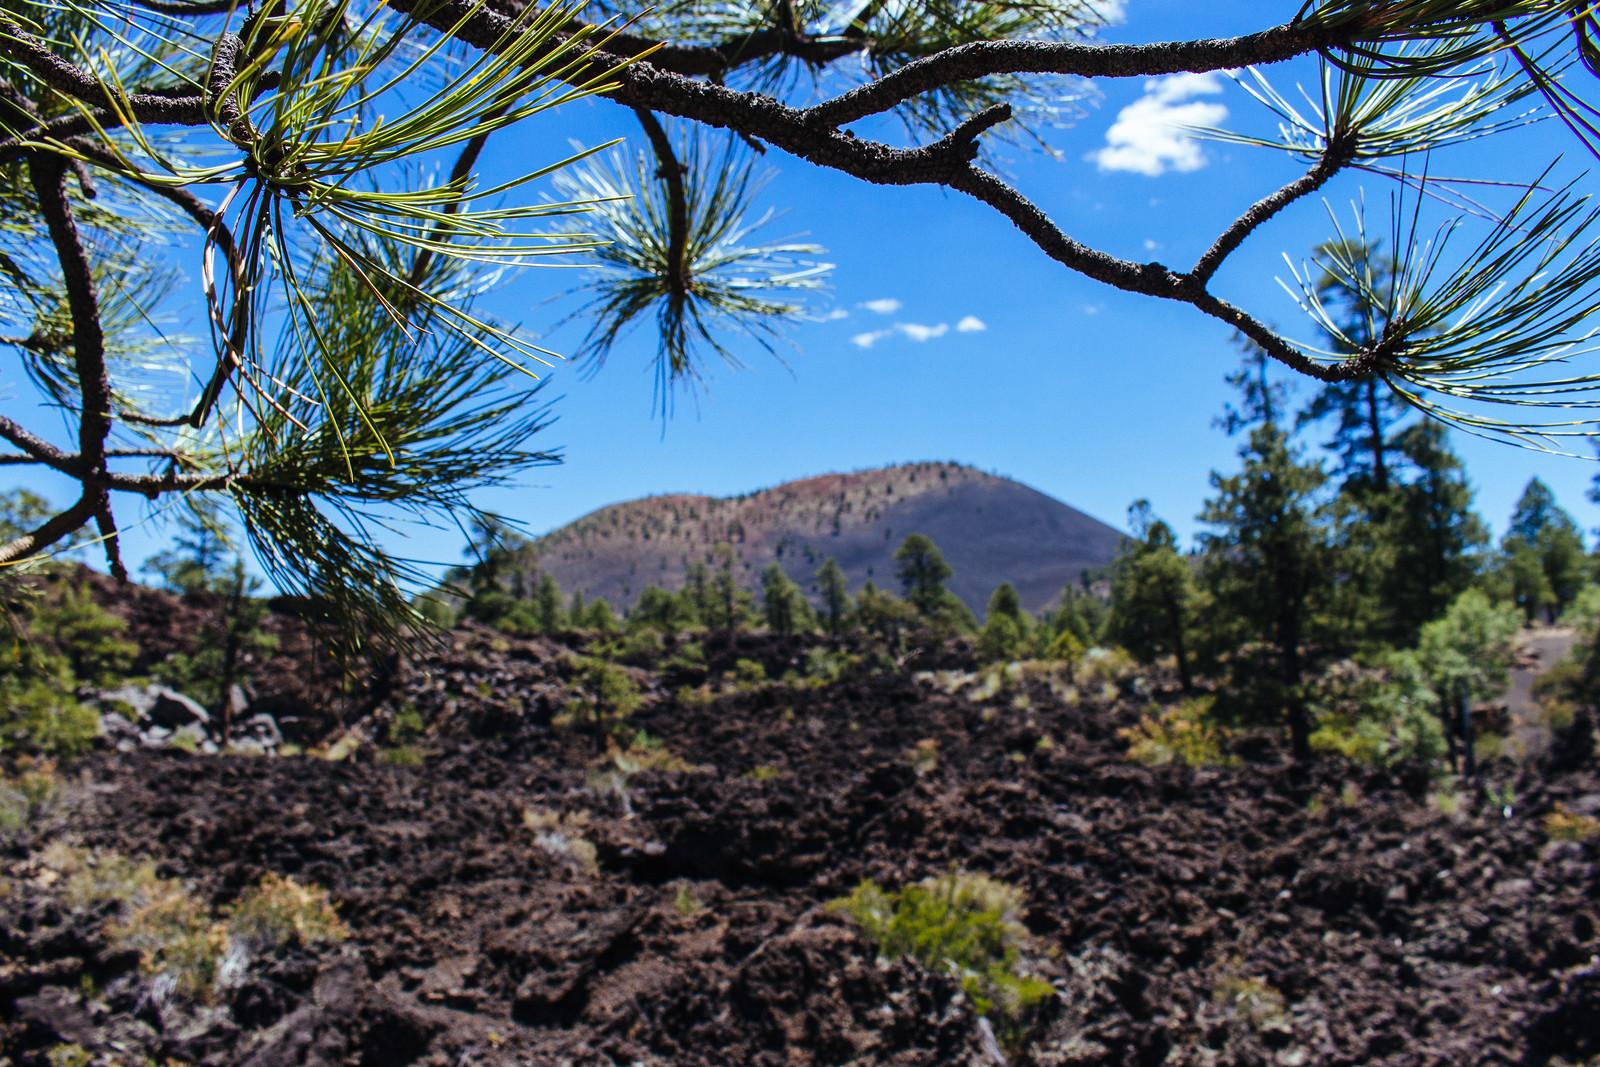 Cinder cone volcano seen through ponderosa pine branches